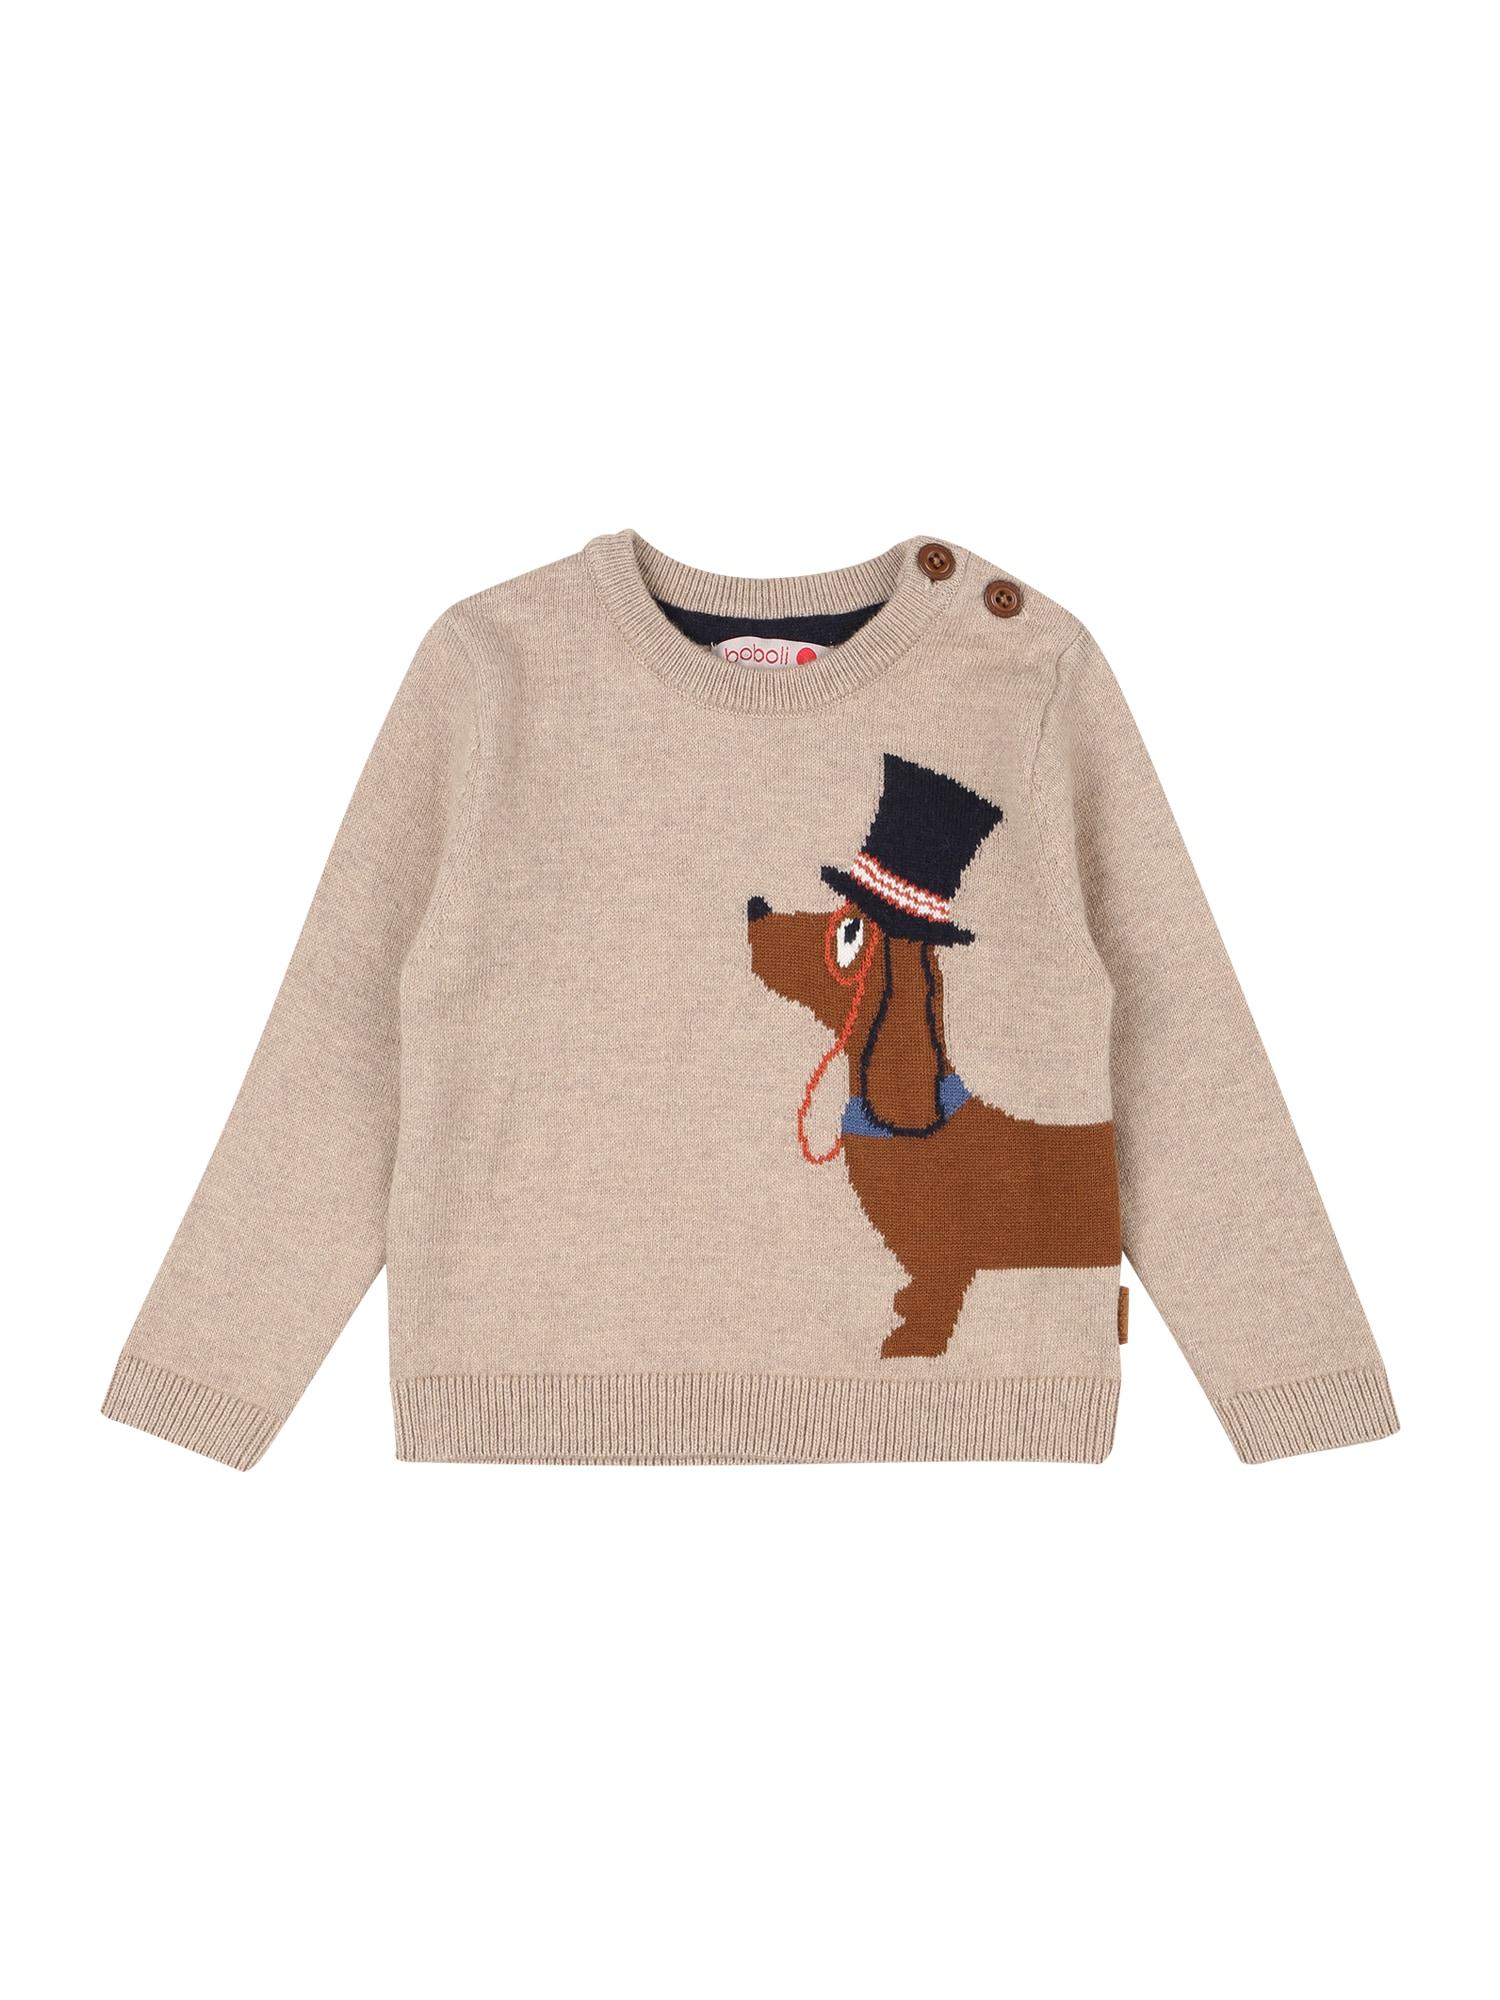 Boboli Megztinis 'Hündchen' smėlio / ruda